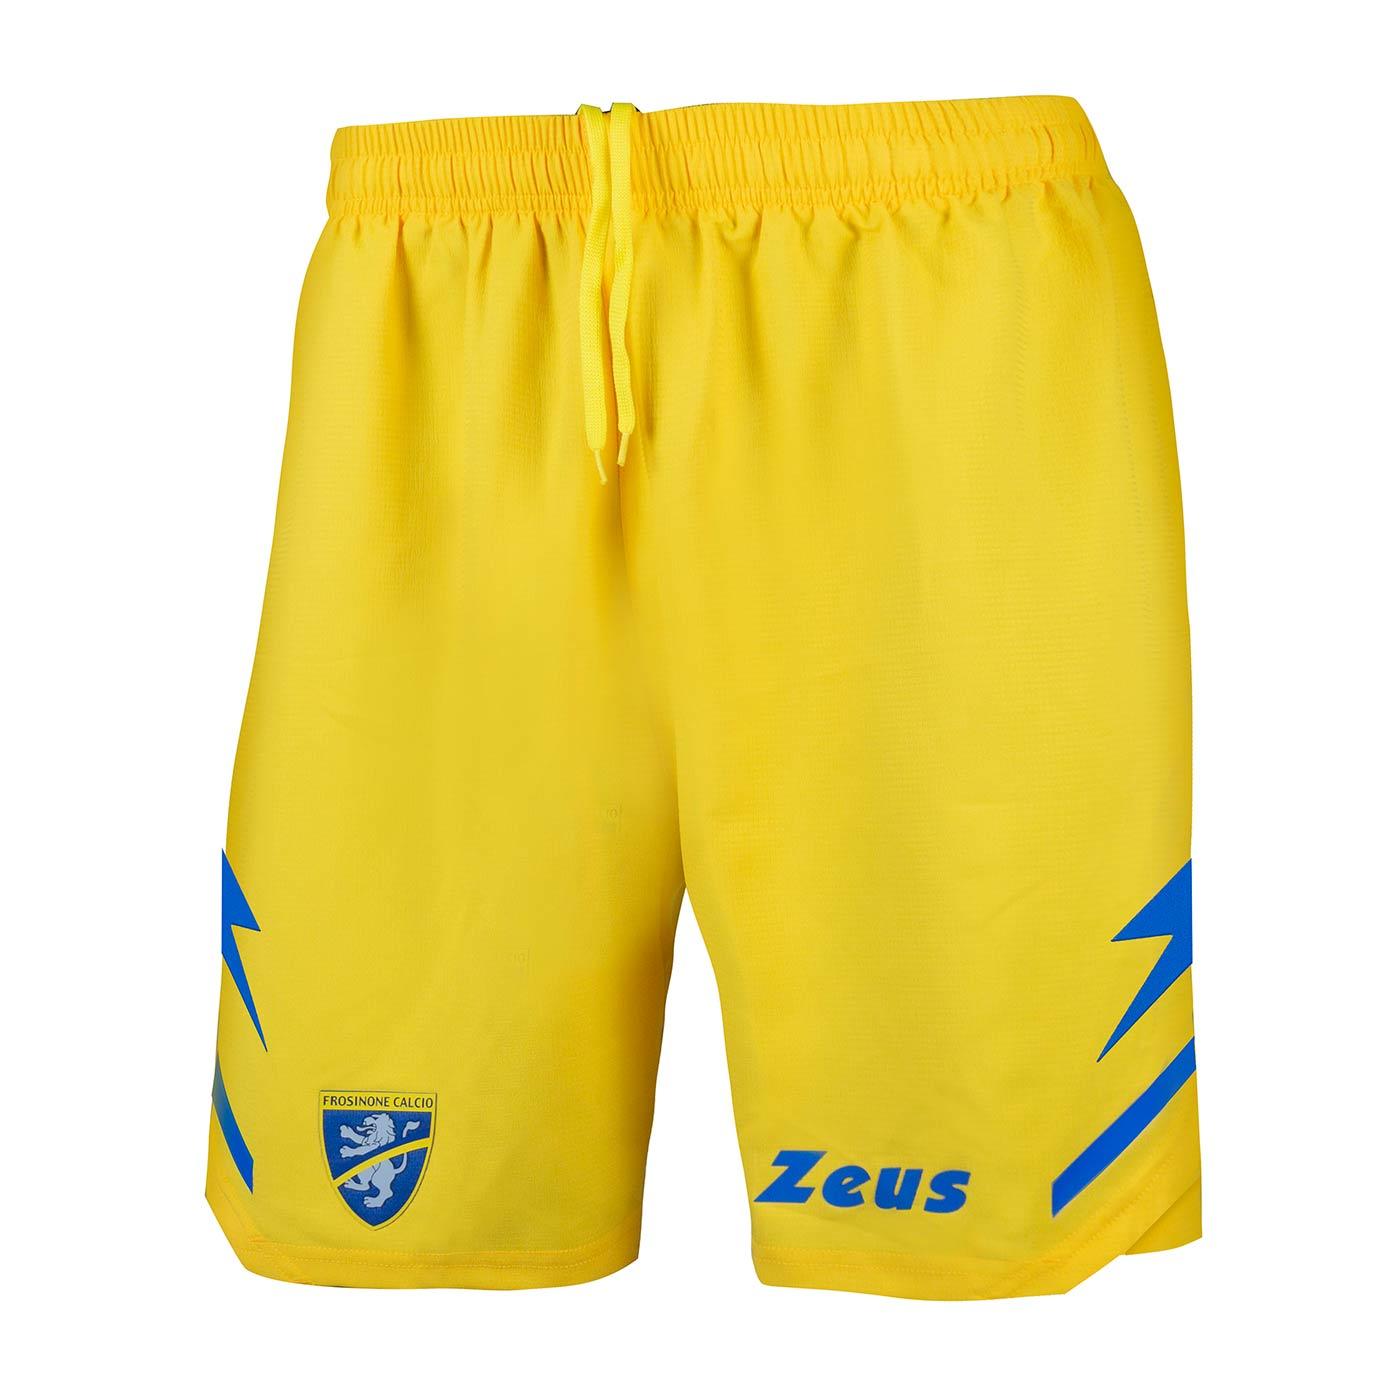 Pantaloncini Frosinone gialli home